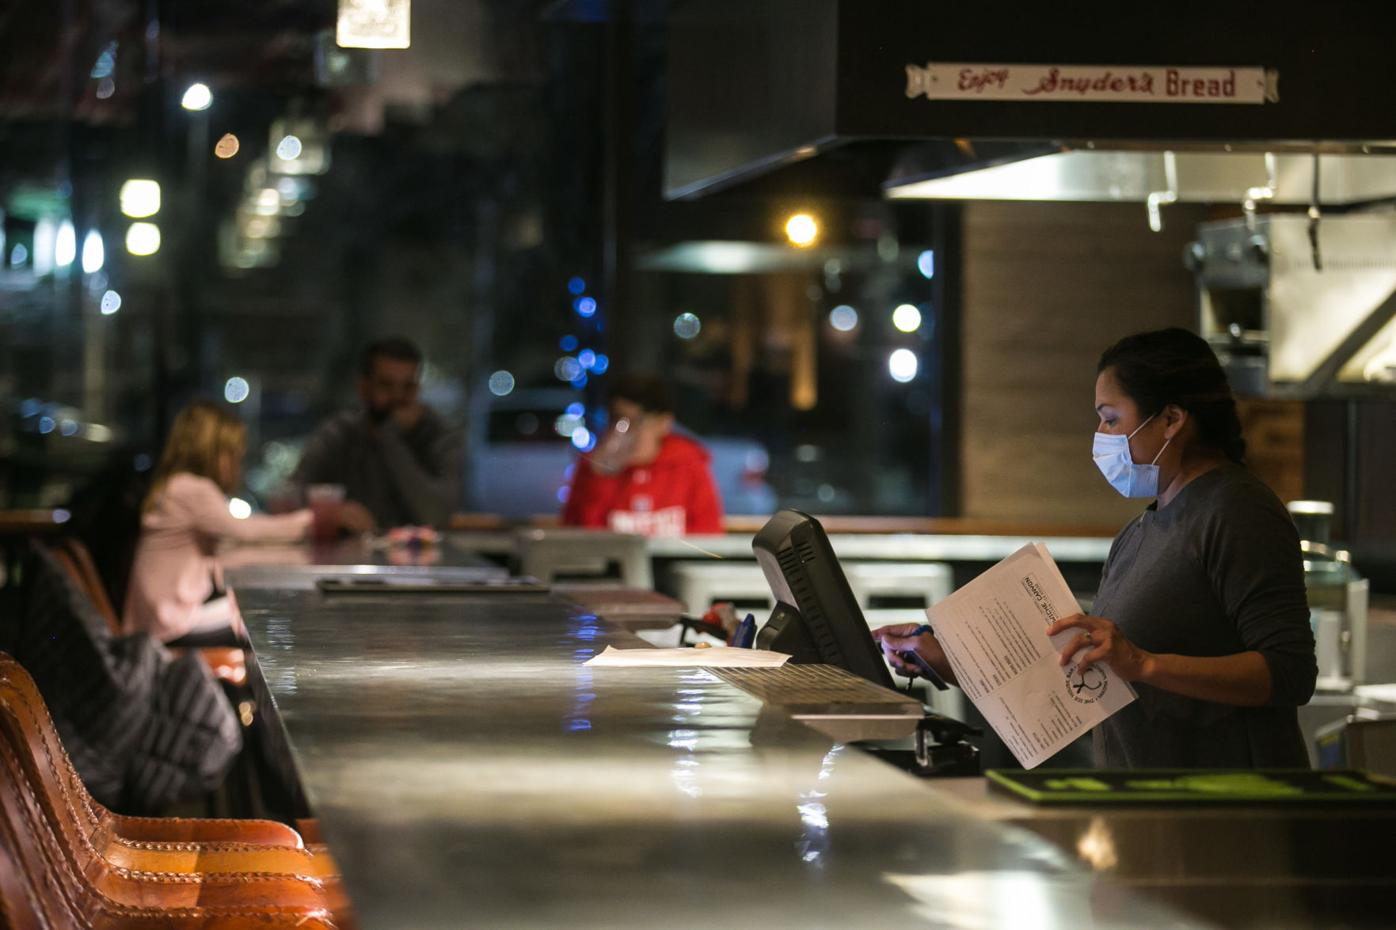 201117-yh-news-restaurants-1.jpg